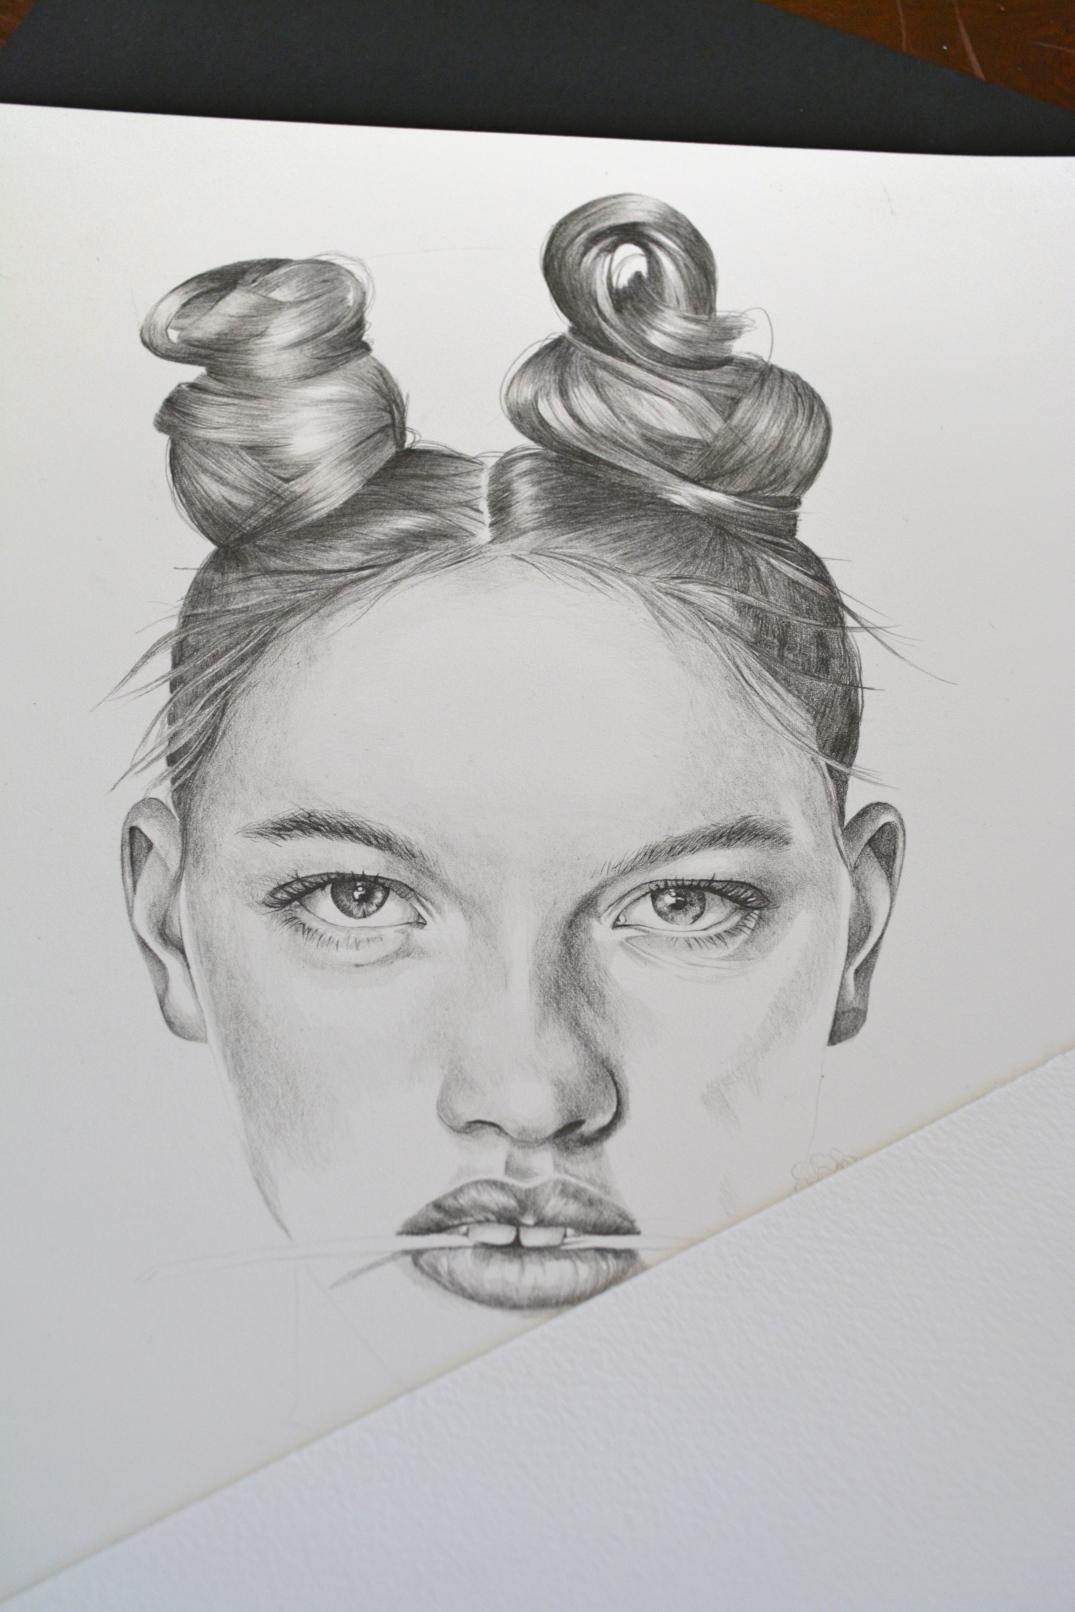 Star sign illustration - Capricorn work in progress